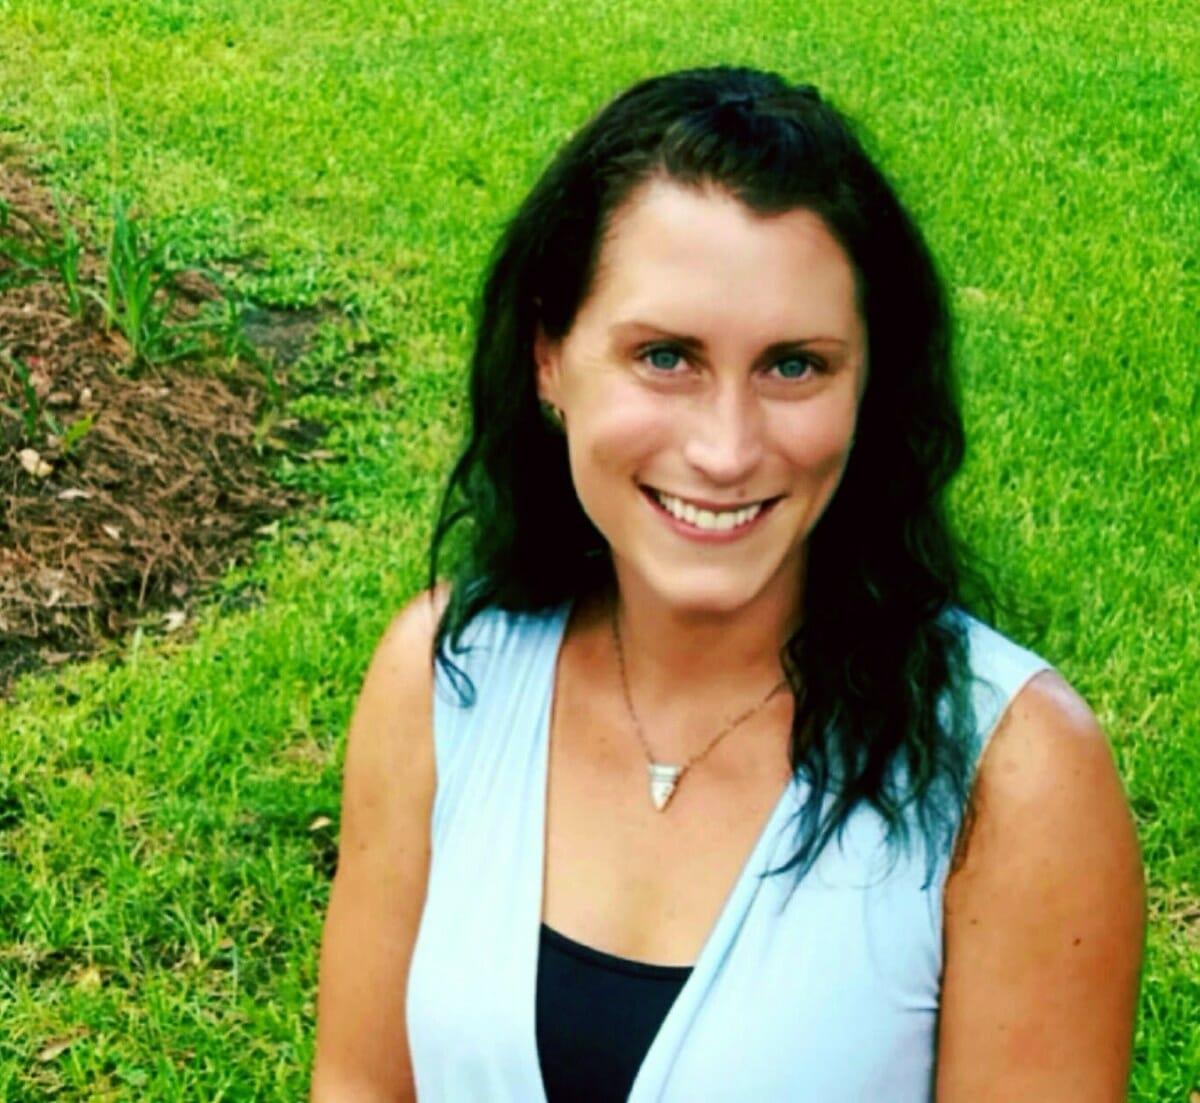 Megan Love Grabowski